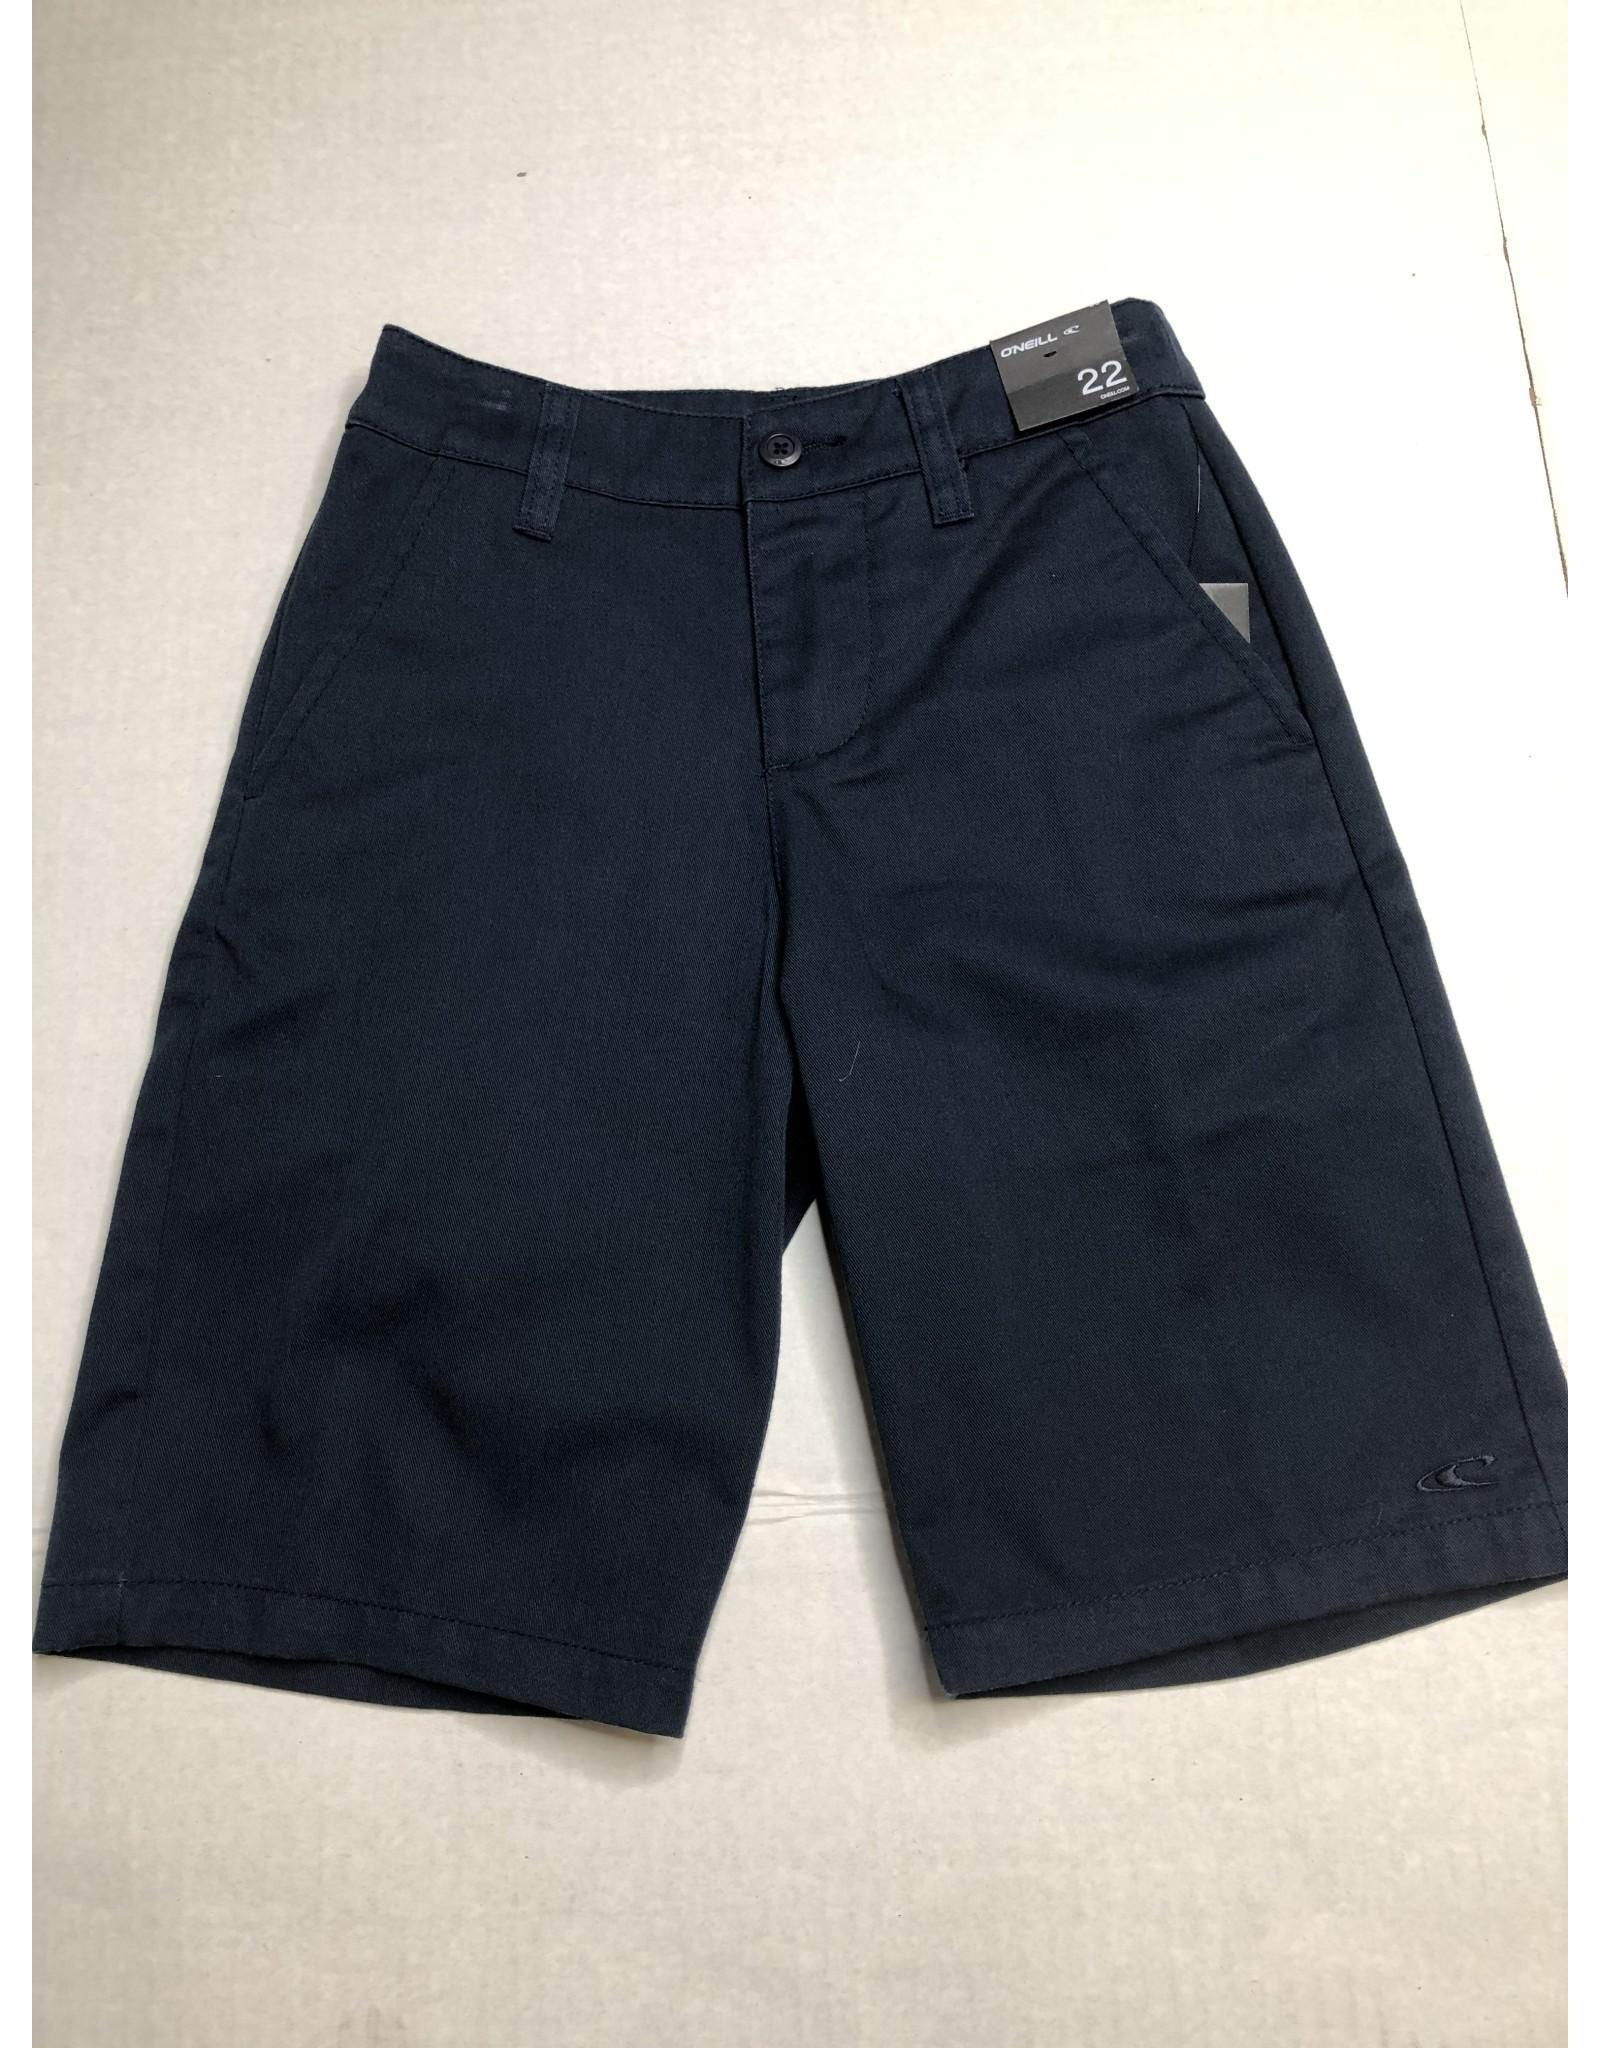 O'Neill Sportswear Contact Short-Navy